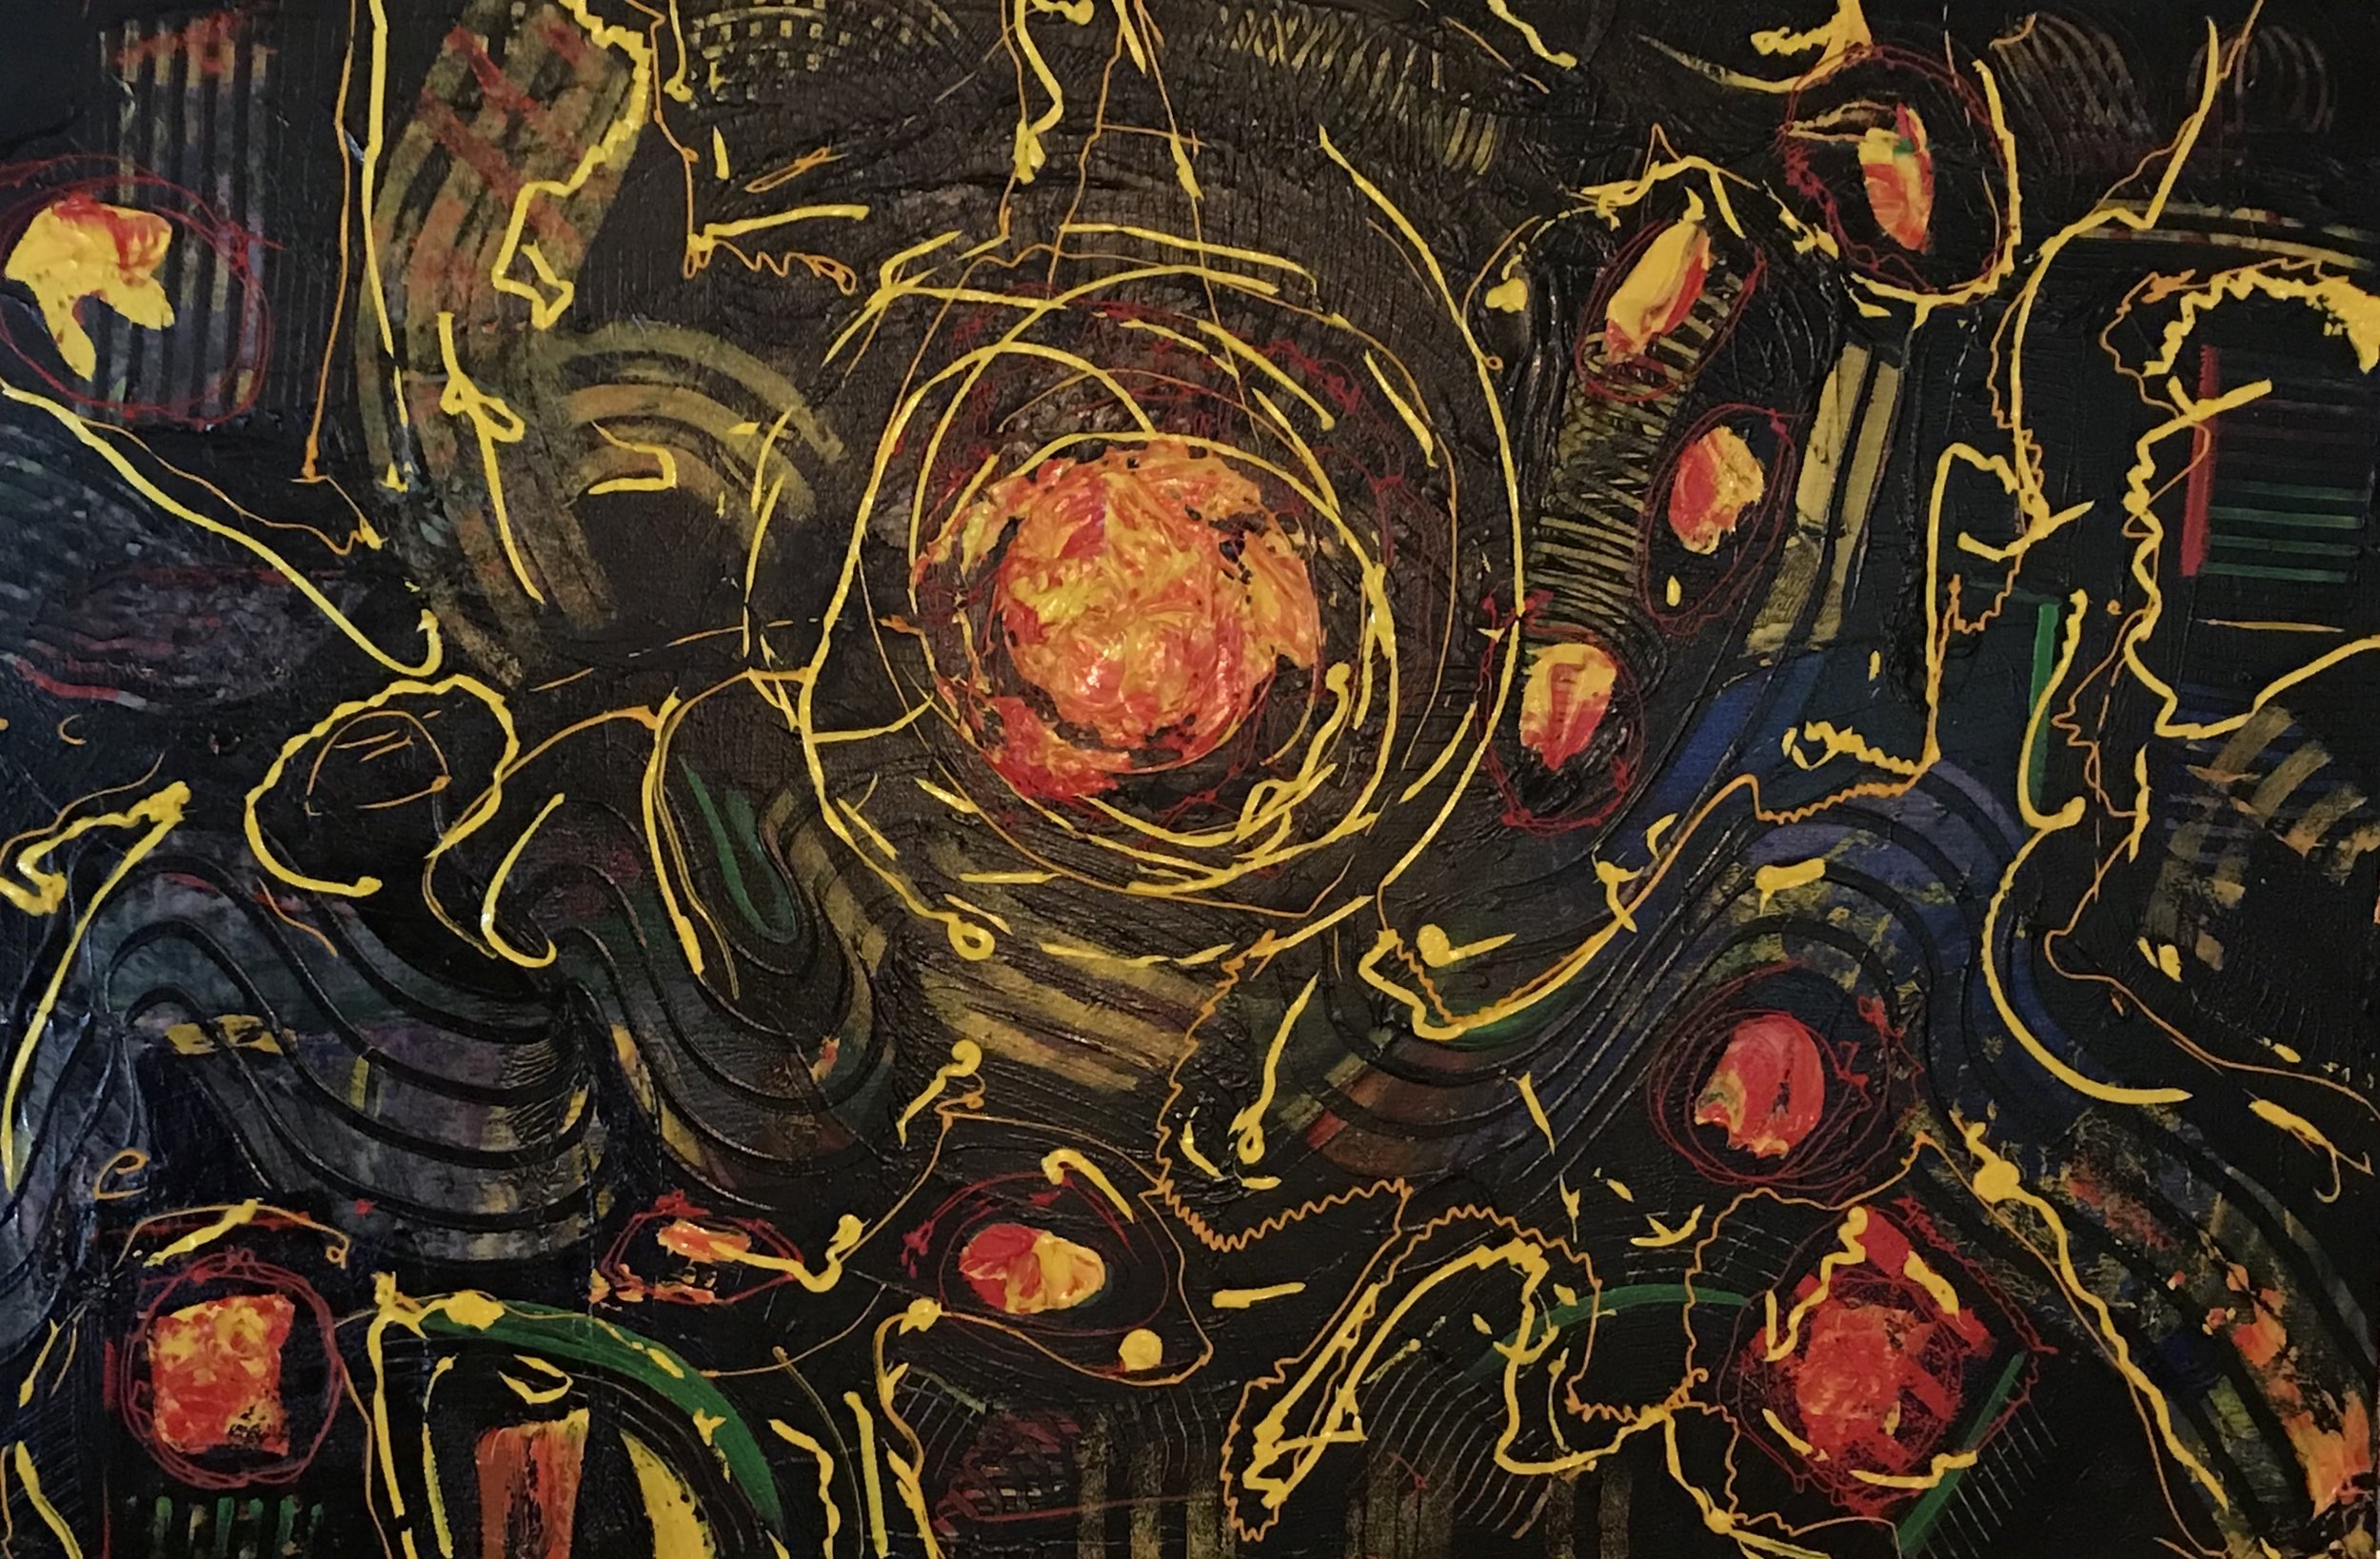 Sheila Cahill - _Hot Spot_ - 26 x 38 - Acrylic on Canvas - 2018 - $1100.jpeg